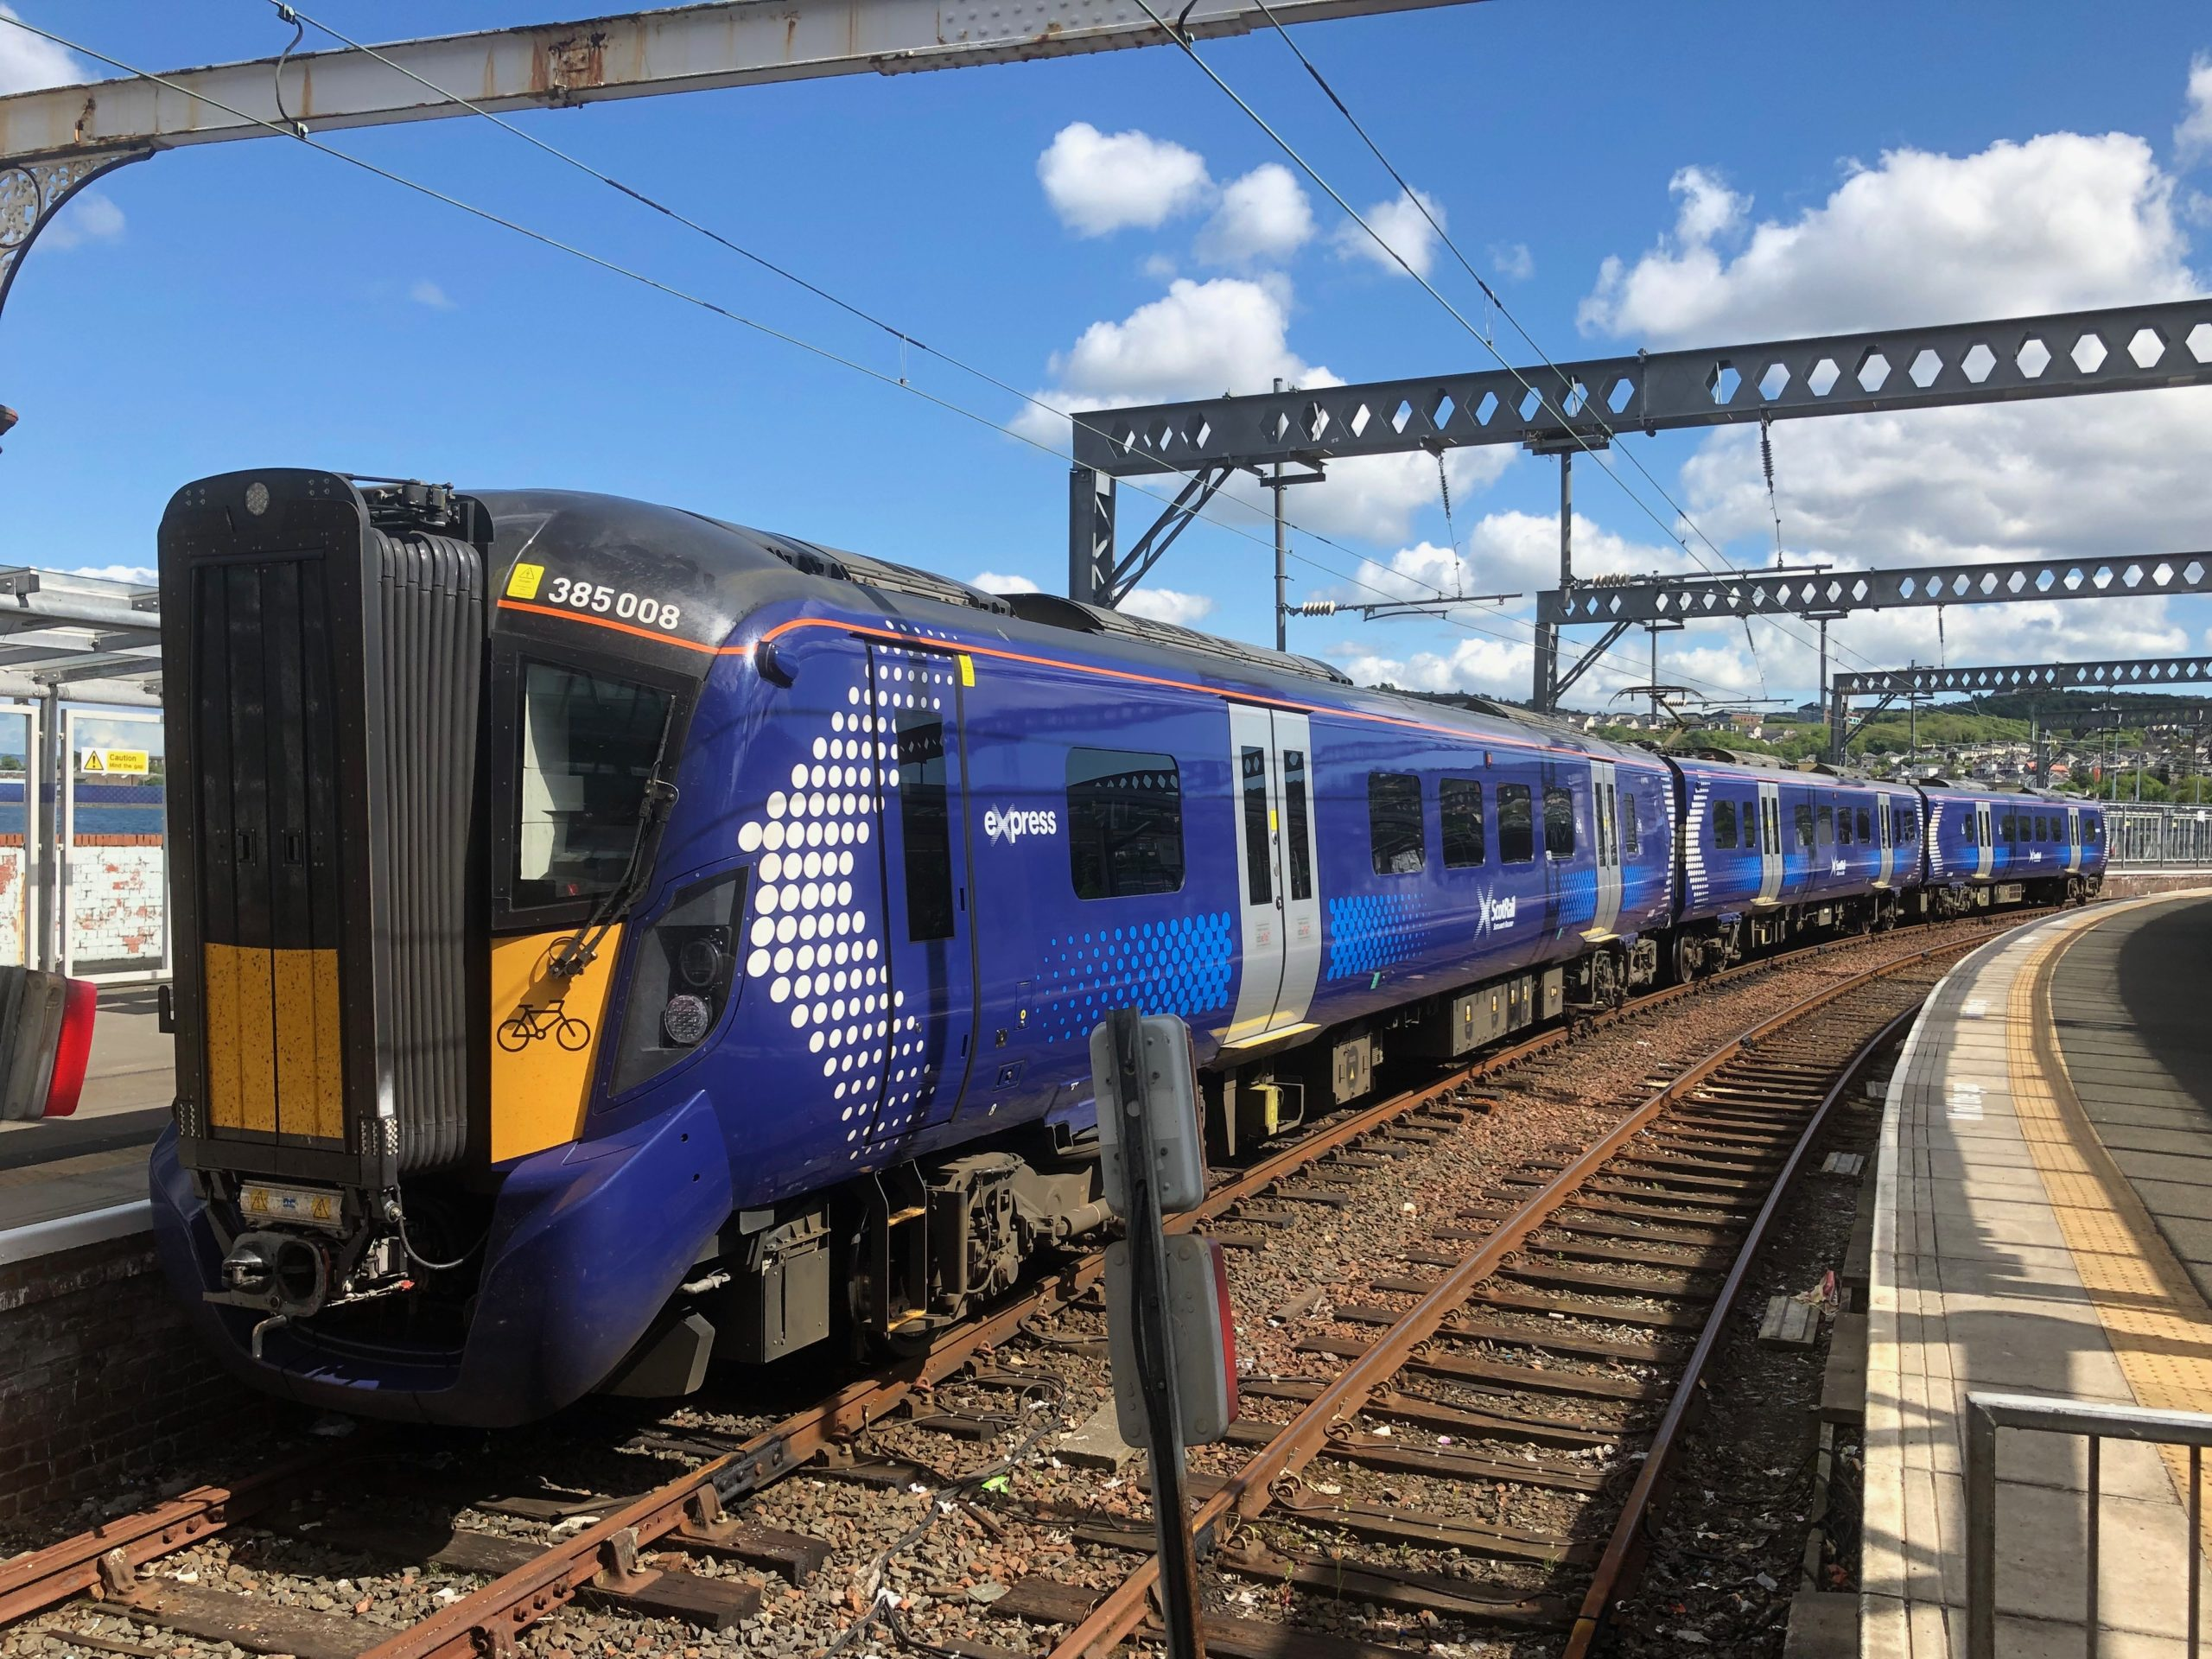 ScotRail Class 385